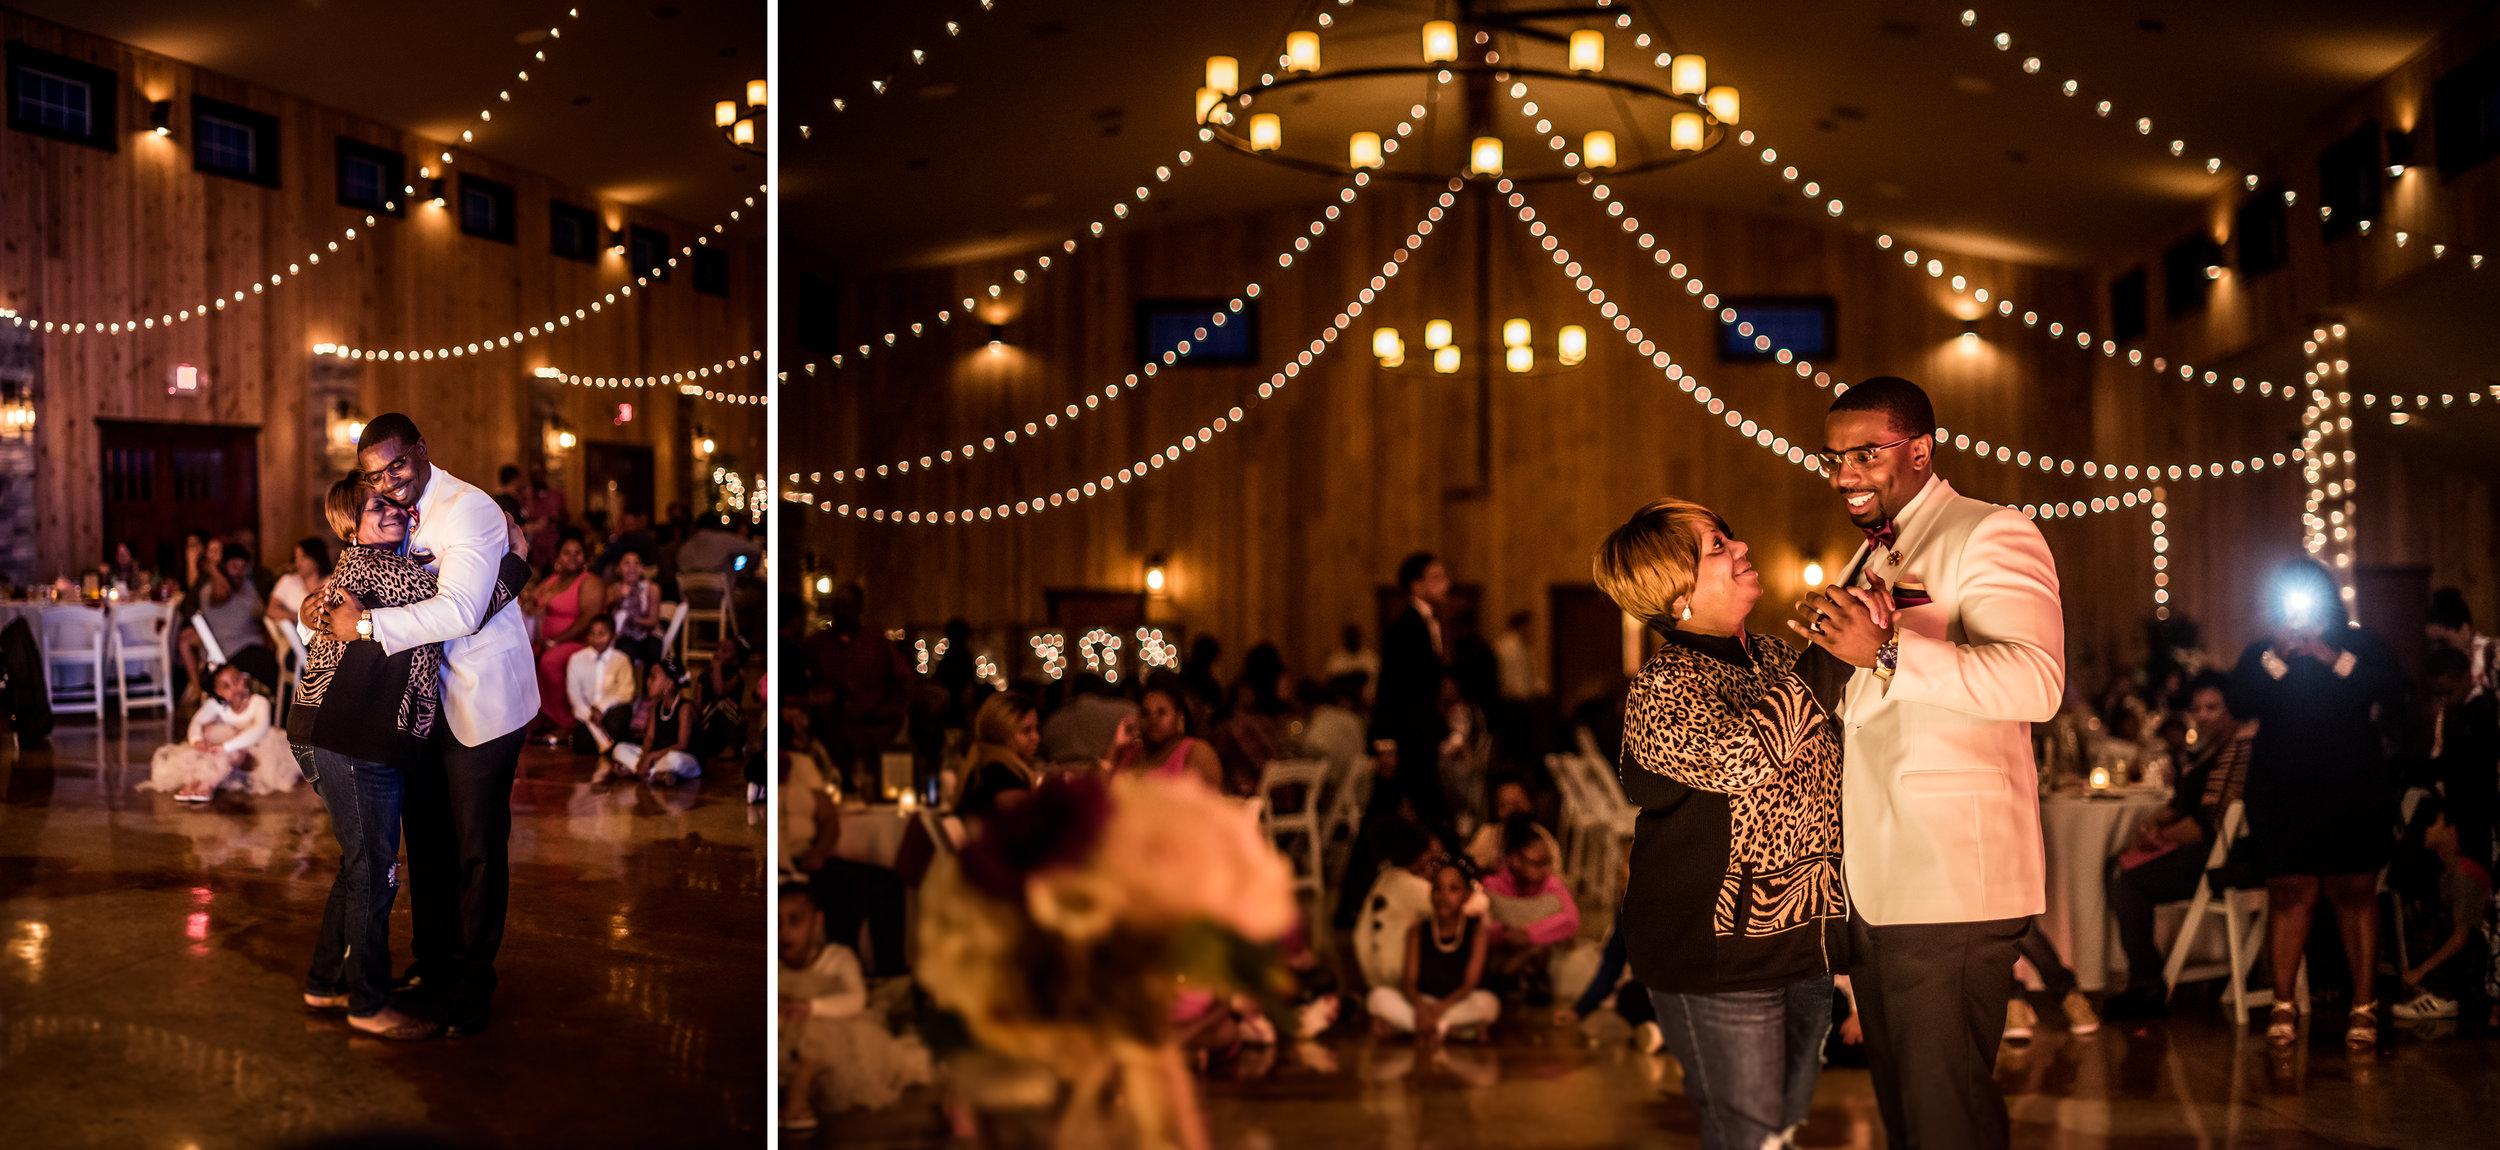 Burlington Iowa Wedding Midwest Photographer Melissa Cervantes _ Chantelle and Isaiah 2027.jpg